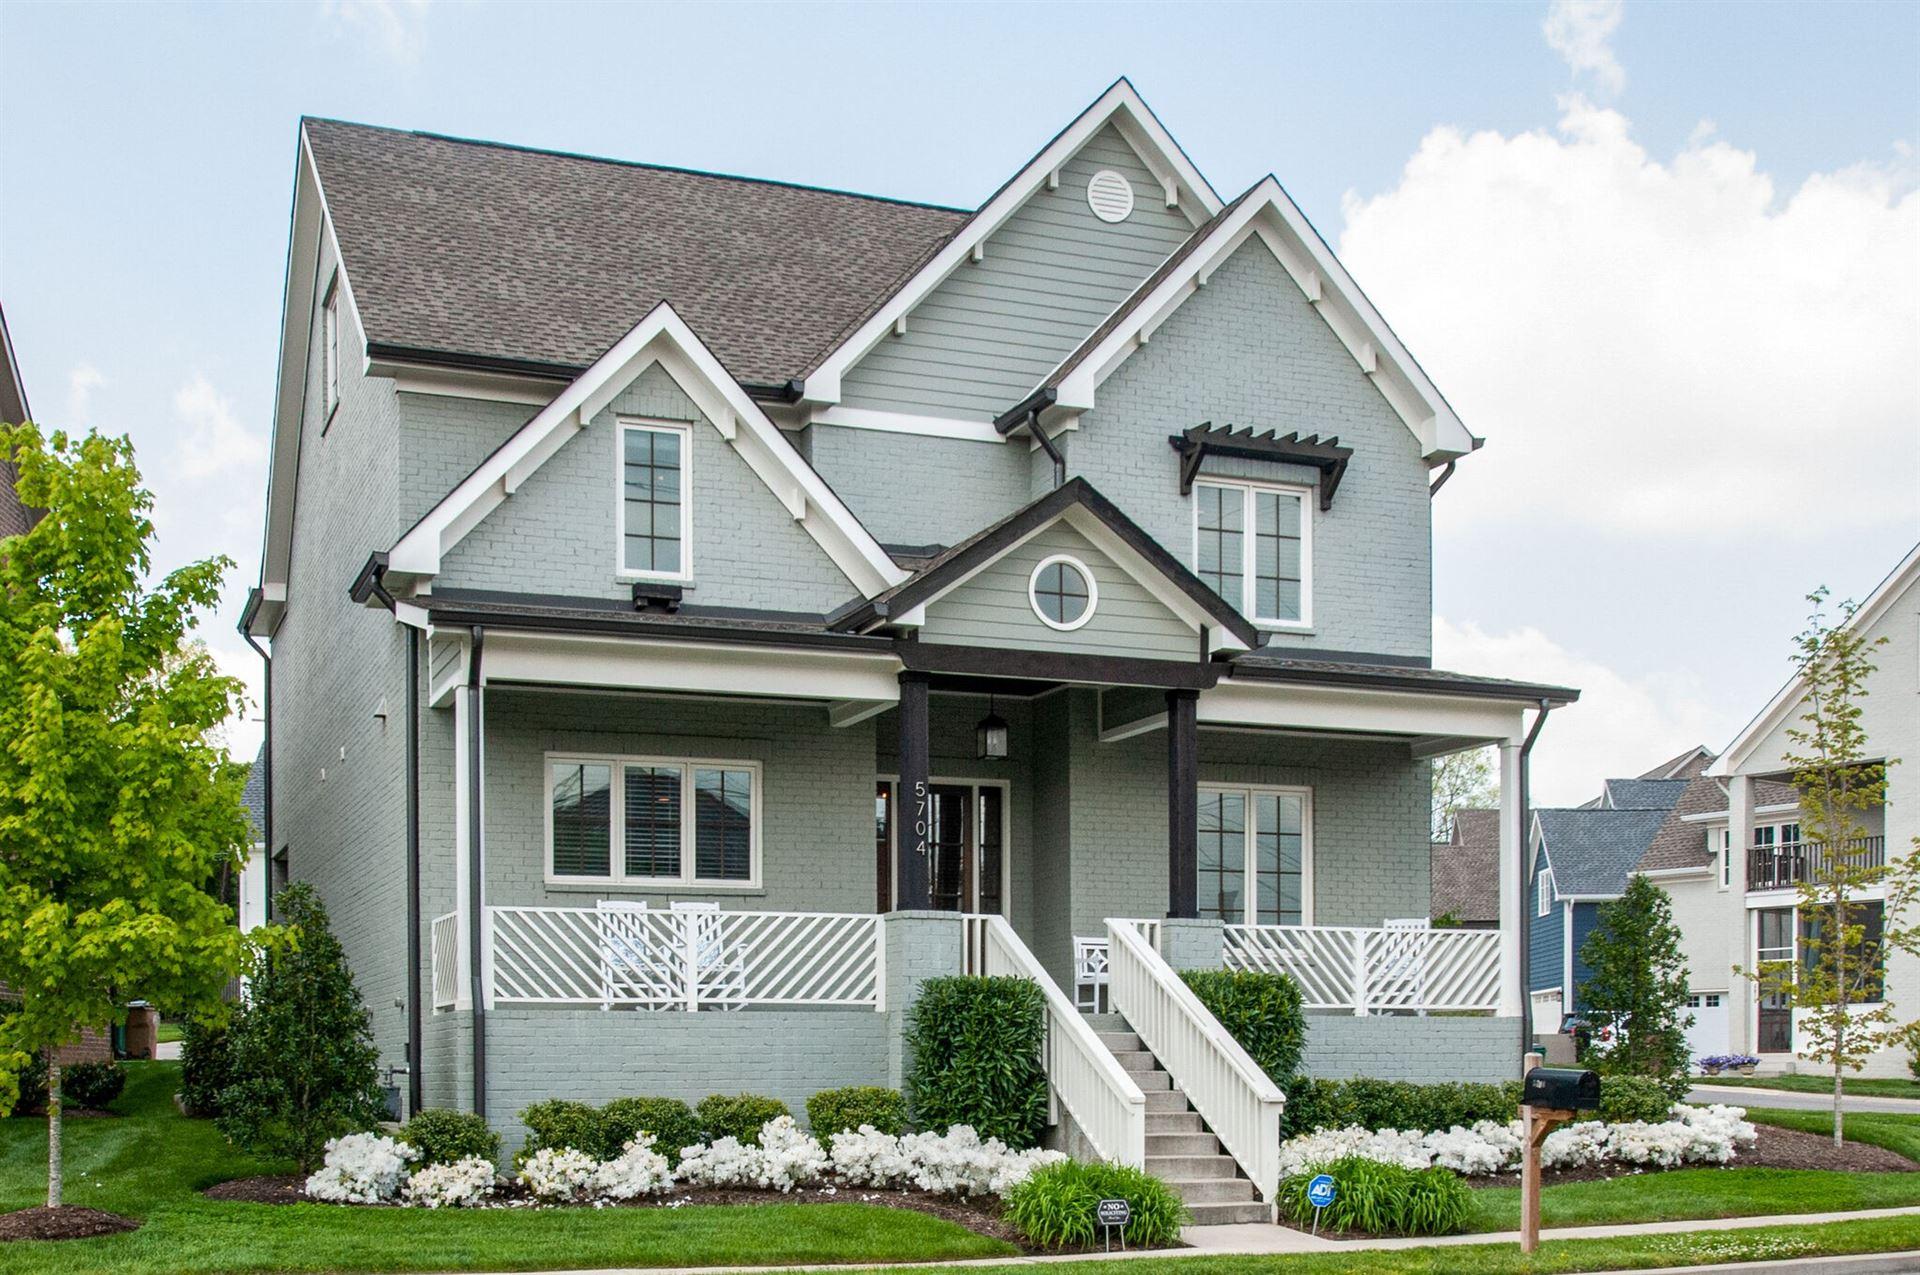 5704 Old Harding Pike, Nashville, TN 37205 - MLS#: 2248423